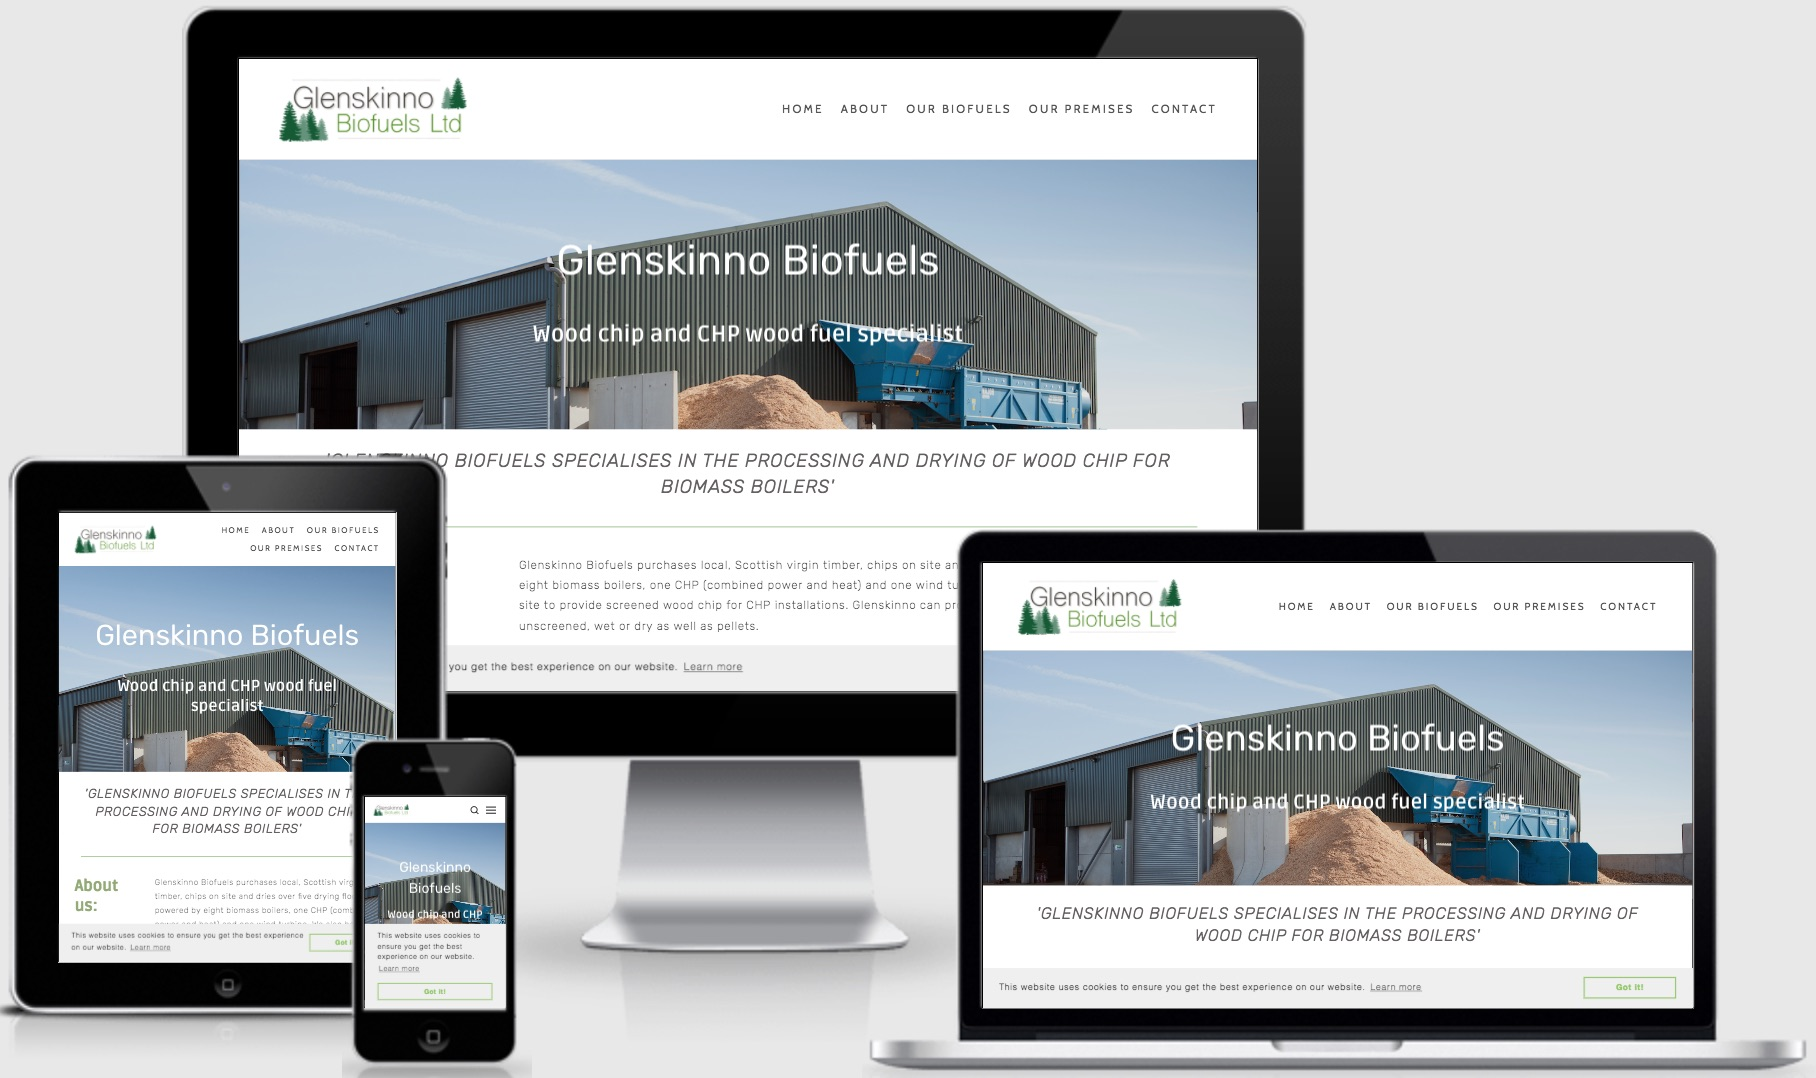 Glenskinno Biofuels.jpg